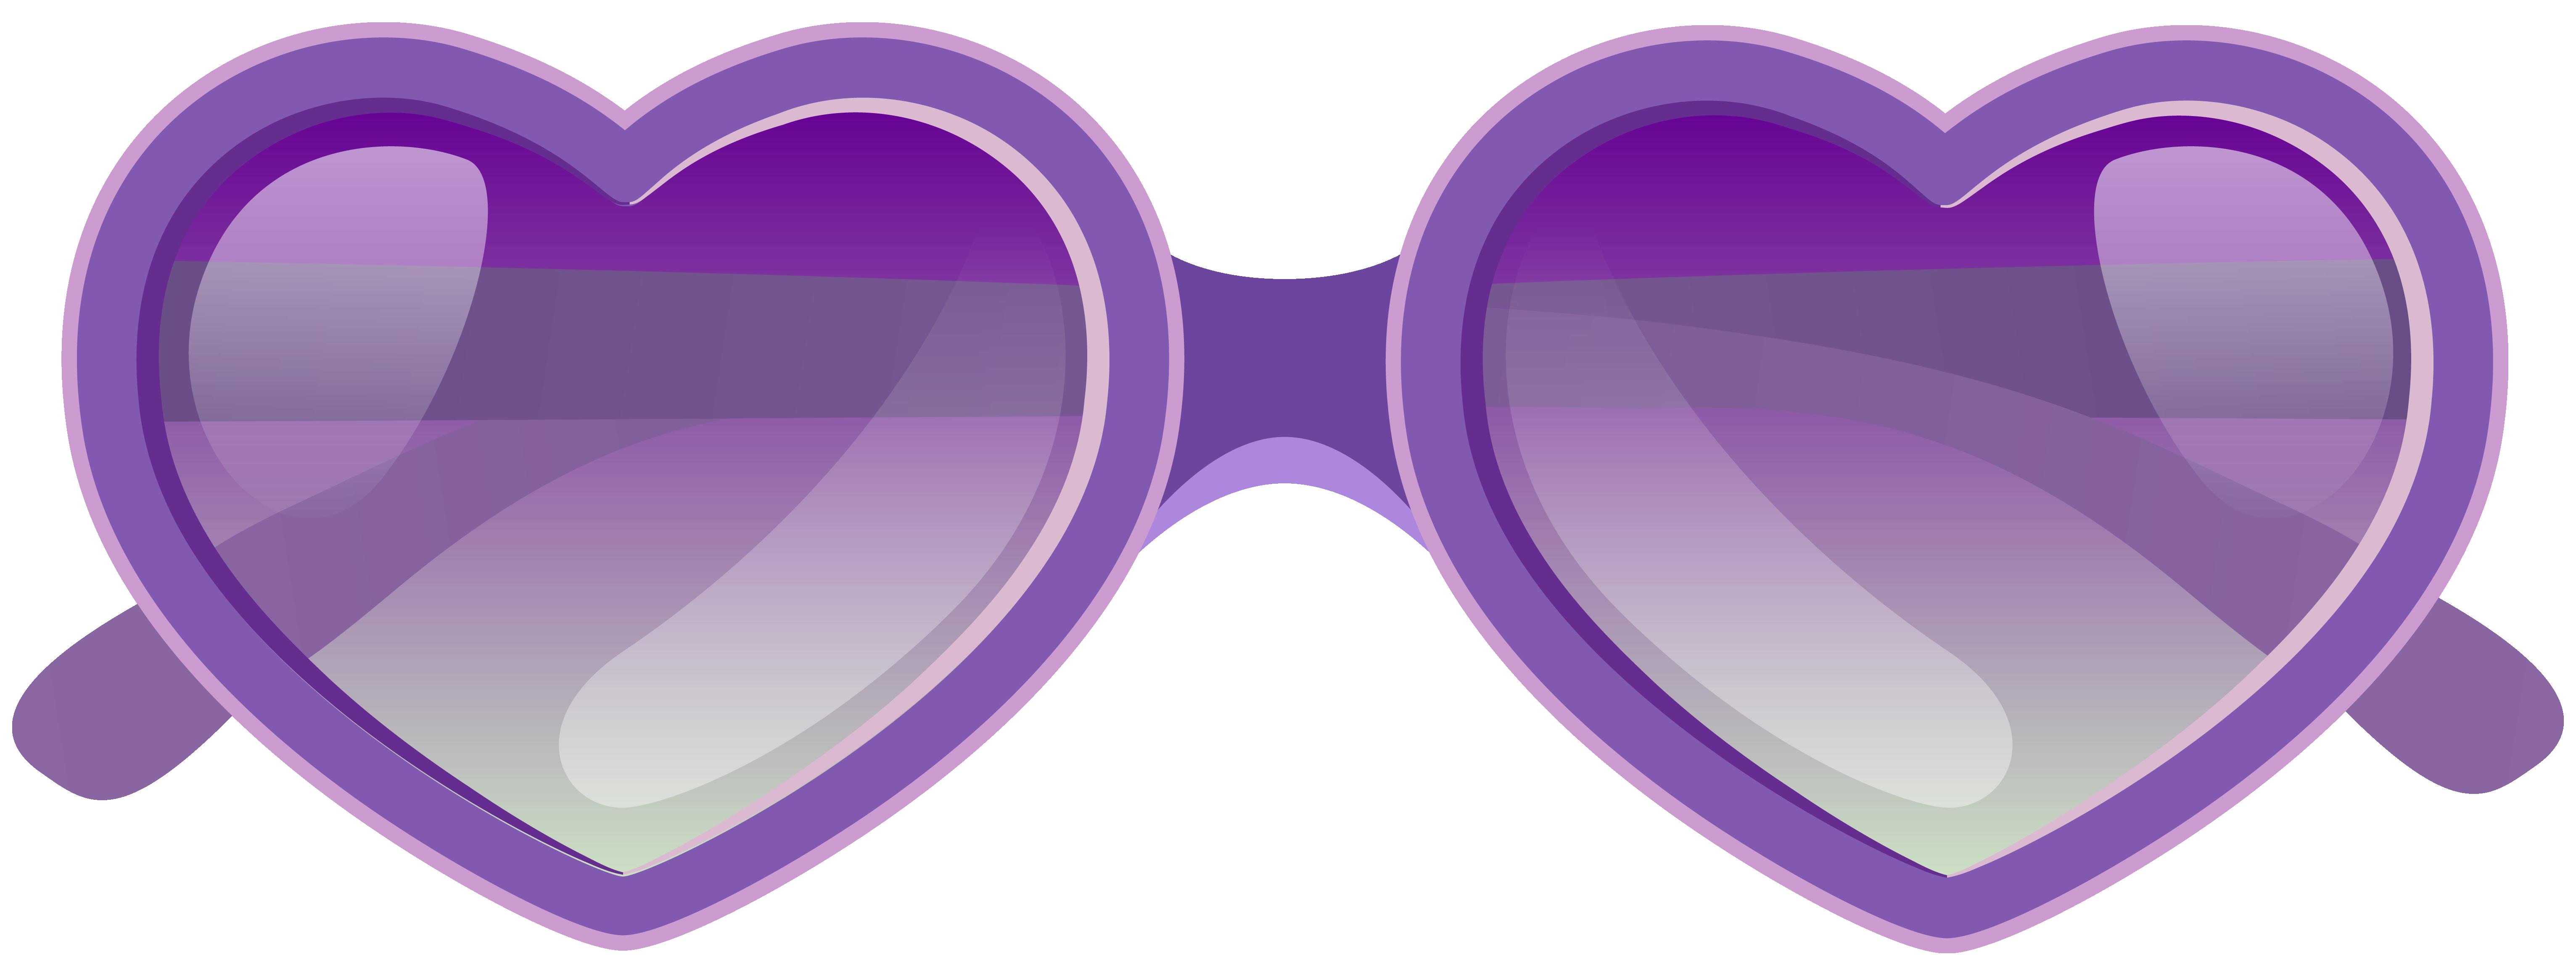 Sunglasses For Dogs Clip Art Google Search Dog Clip Art Clip Art Dog Clip